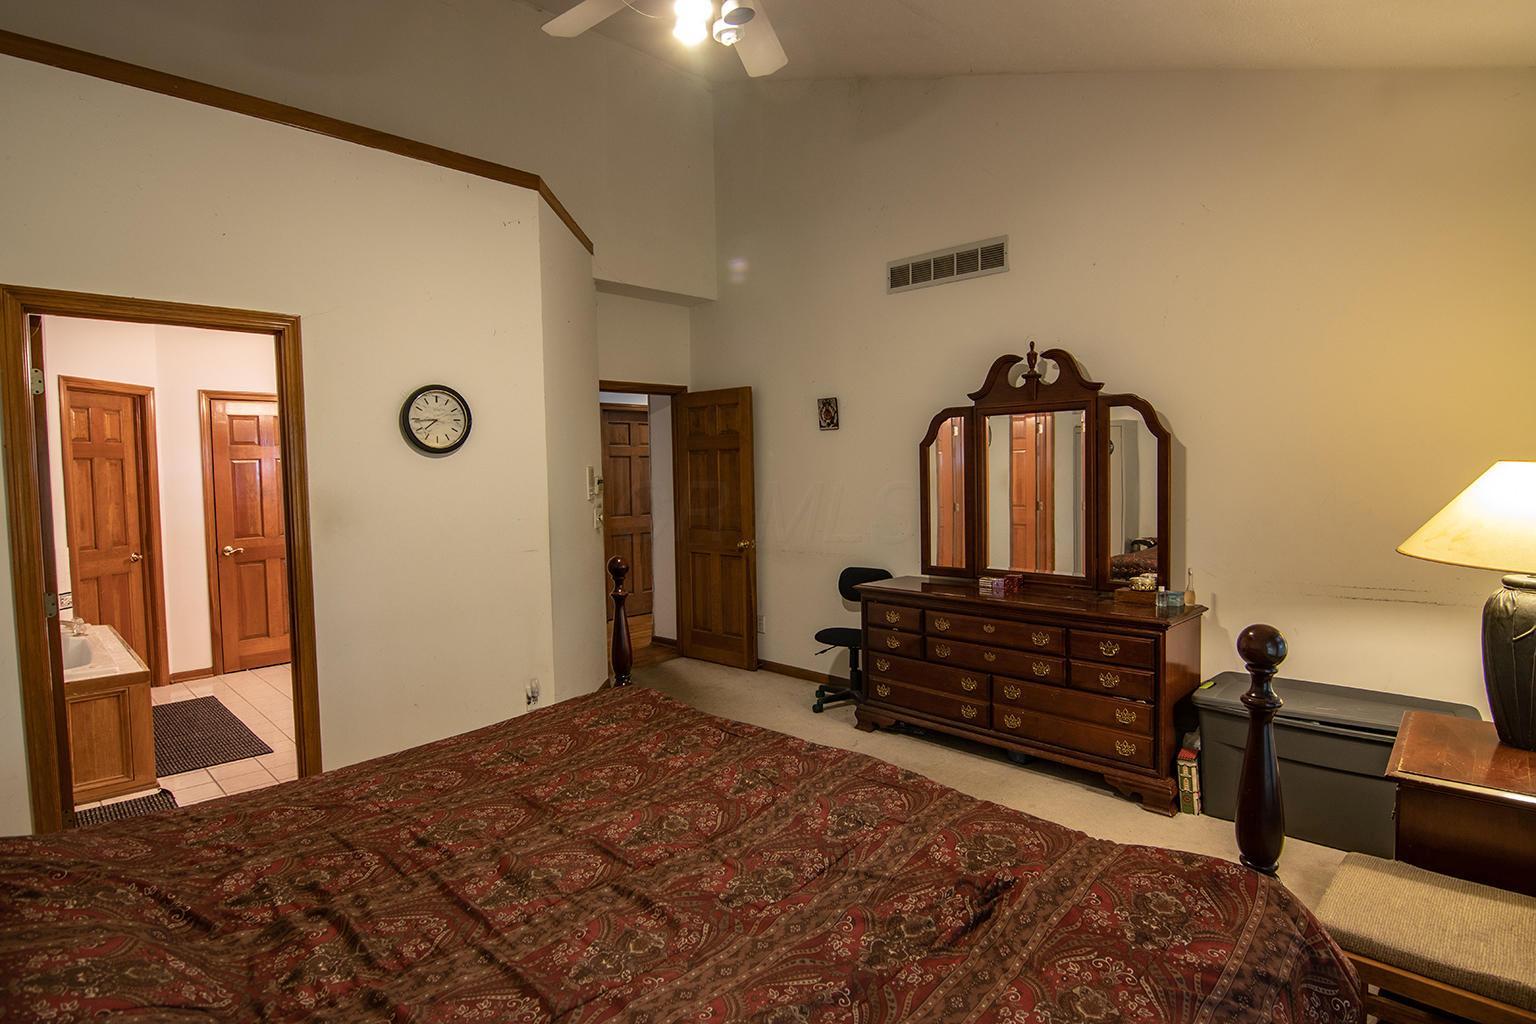 8727 Dustin Road, Galena, Ohio 43021, 4 Bedrooms Bedrooms, ,3 BathroomsBathrooms,Residential,For Sale,Dustin,220018767